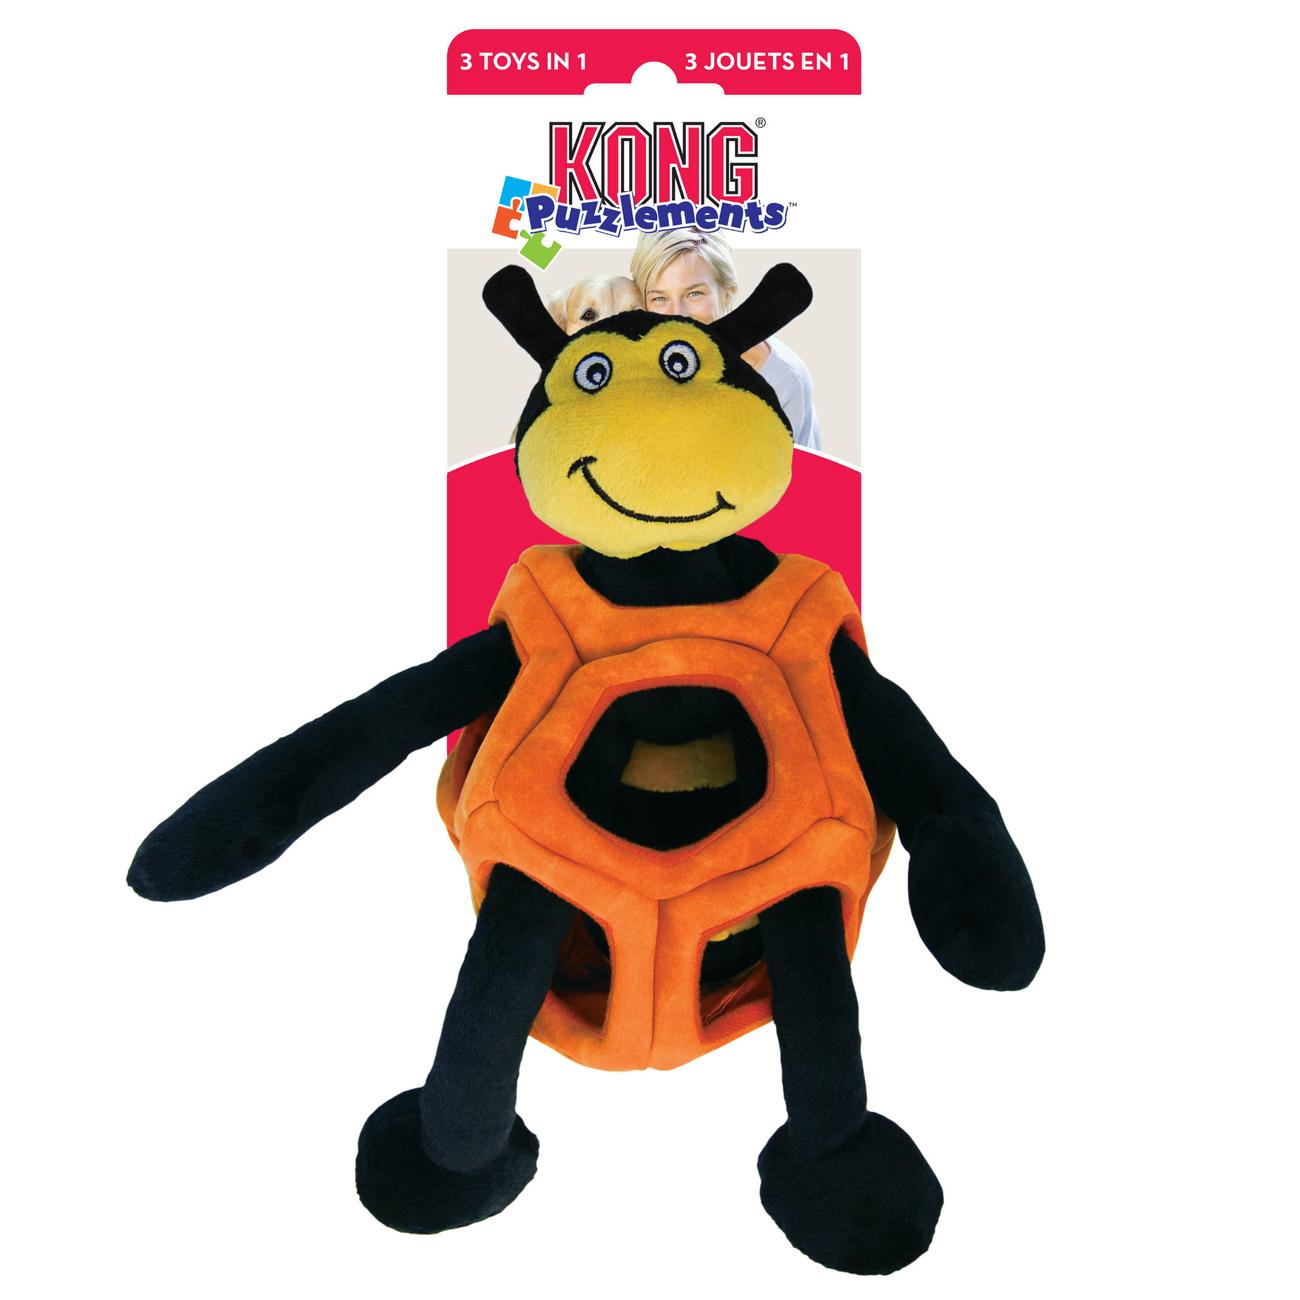 KONG Puzzlements Hundespielzeug, Bild 2